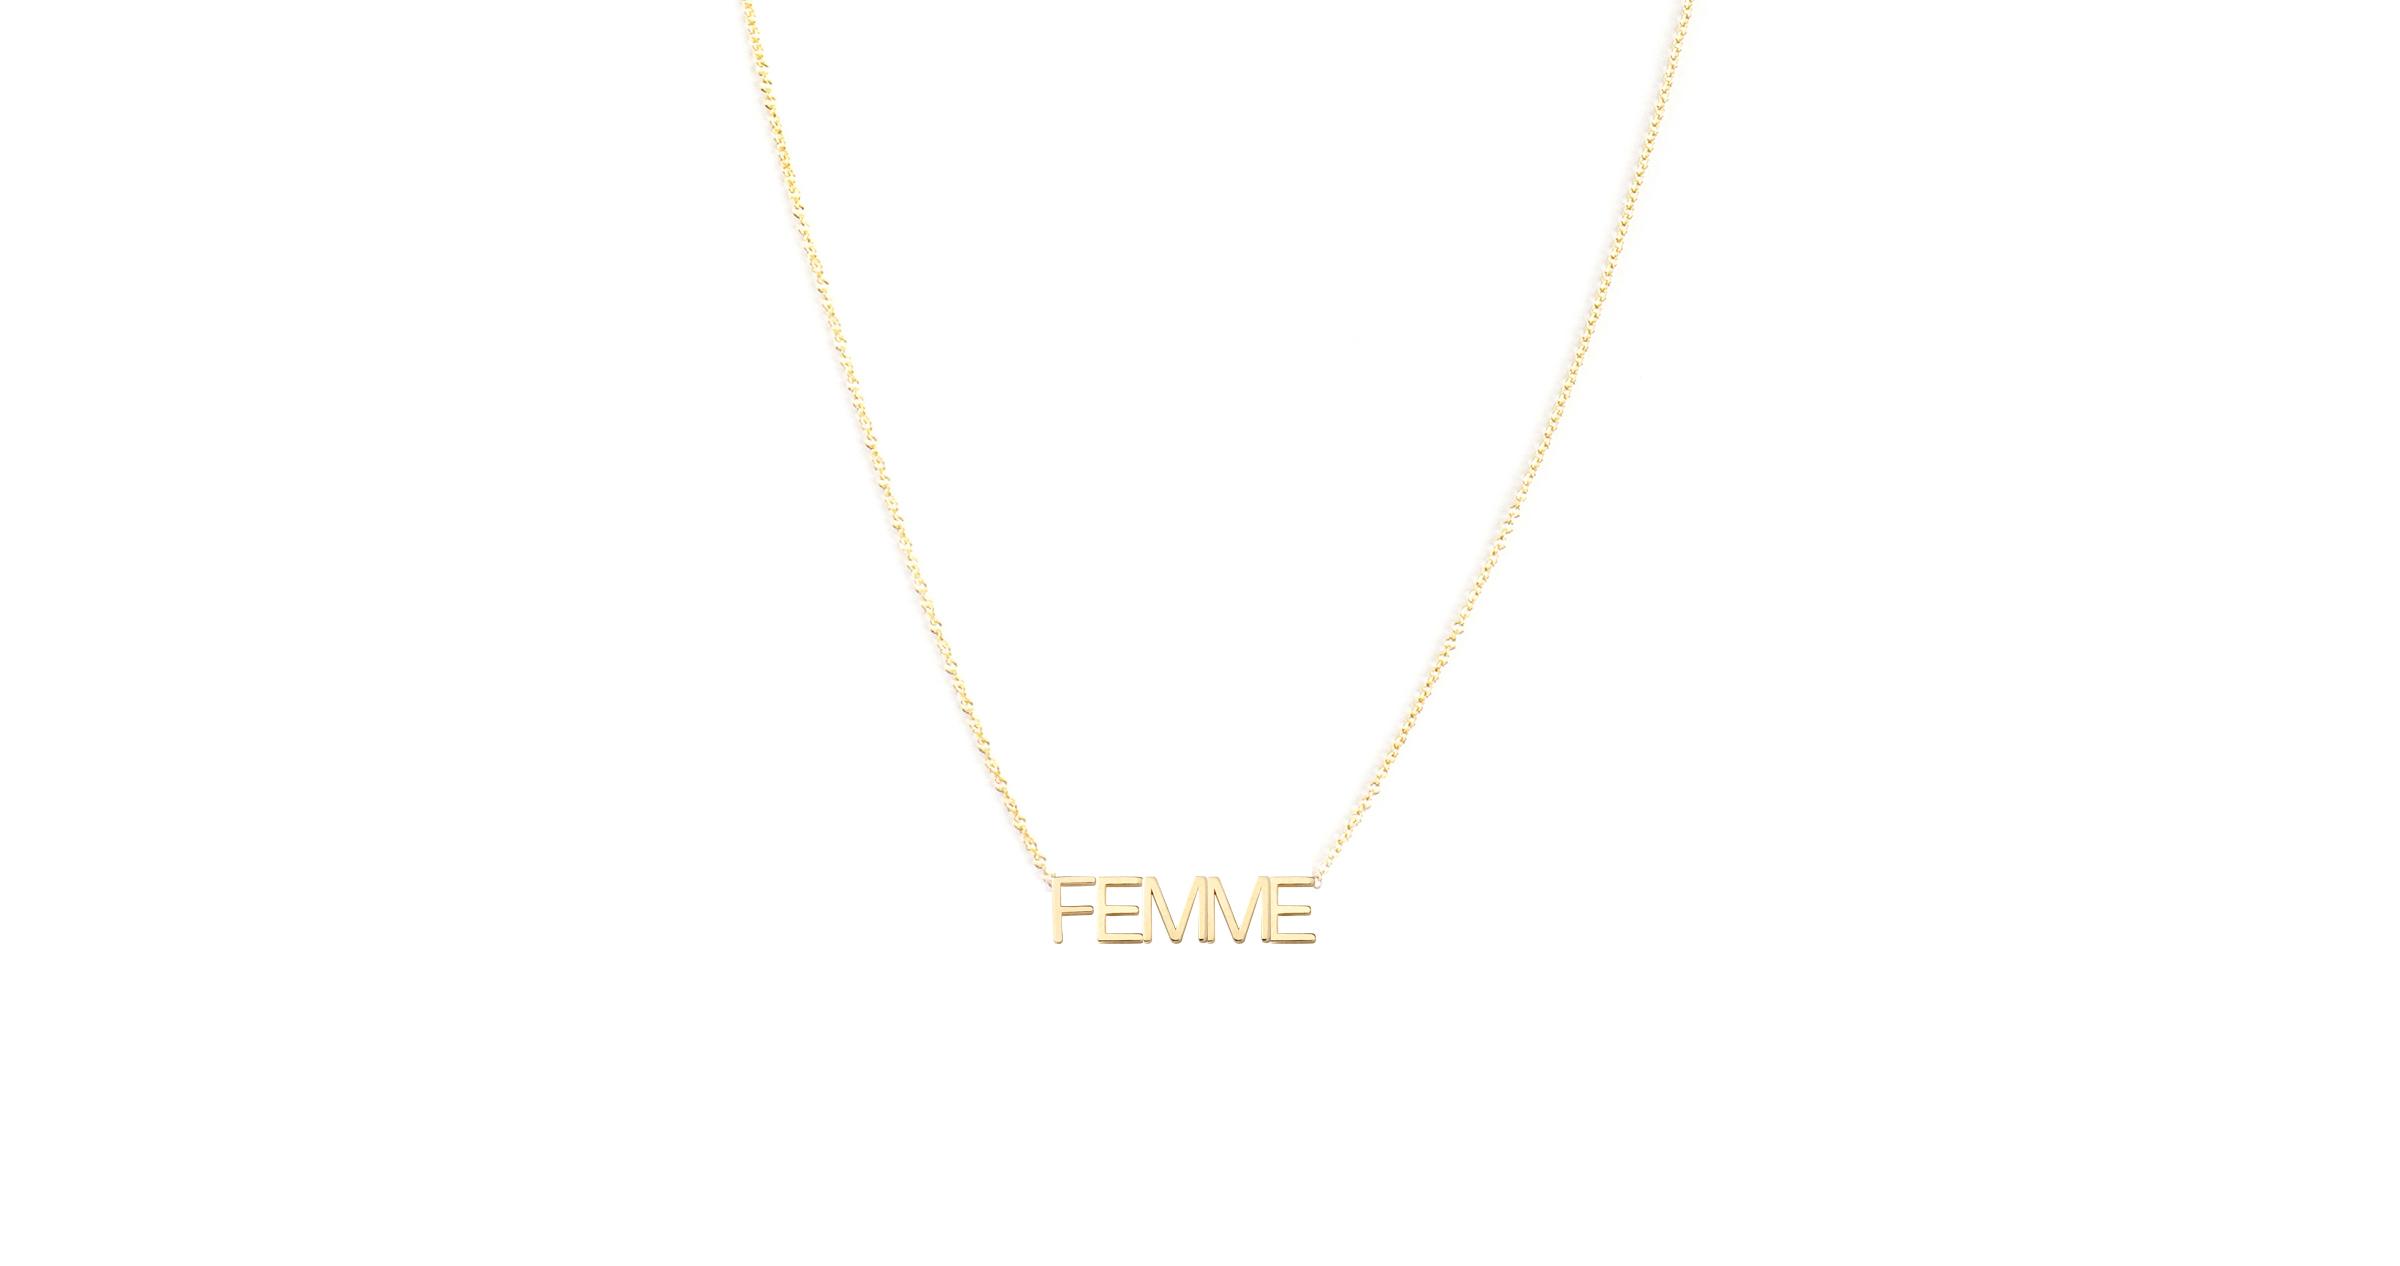 Clare-V-Maya-Brenner-FEMME.jpg